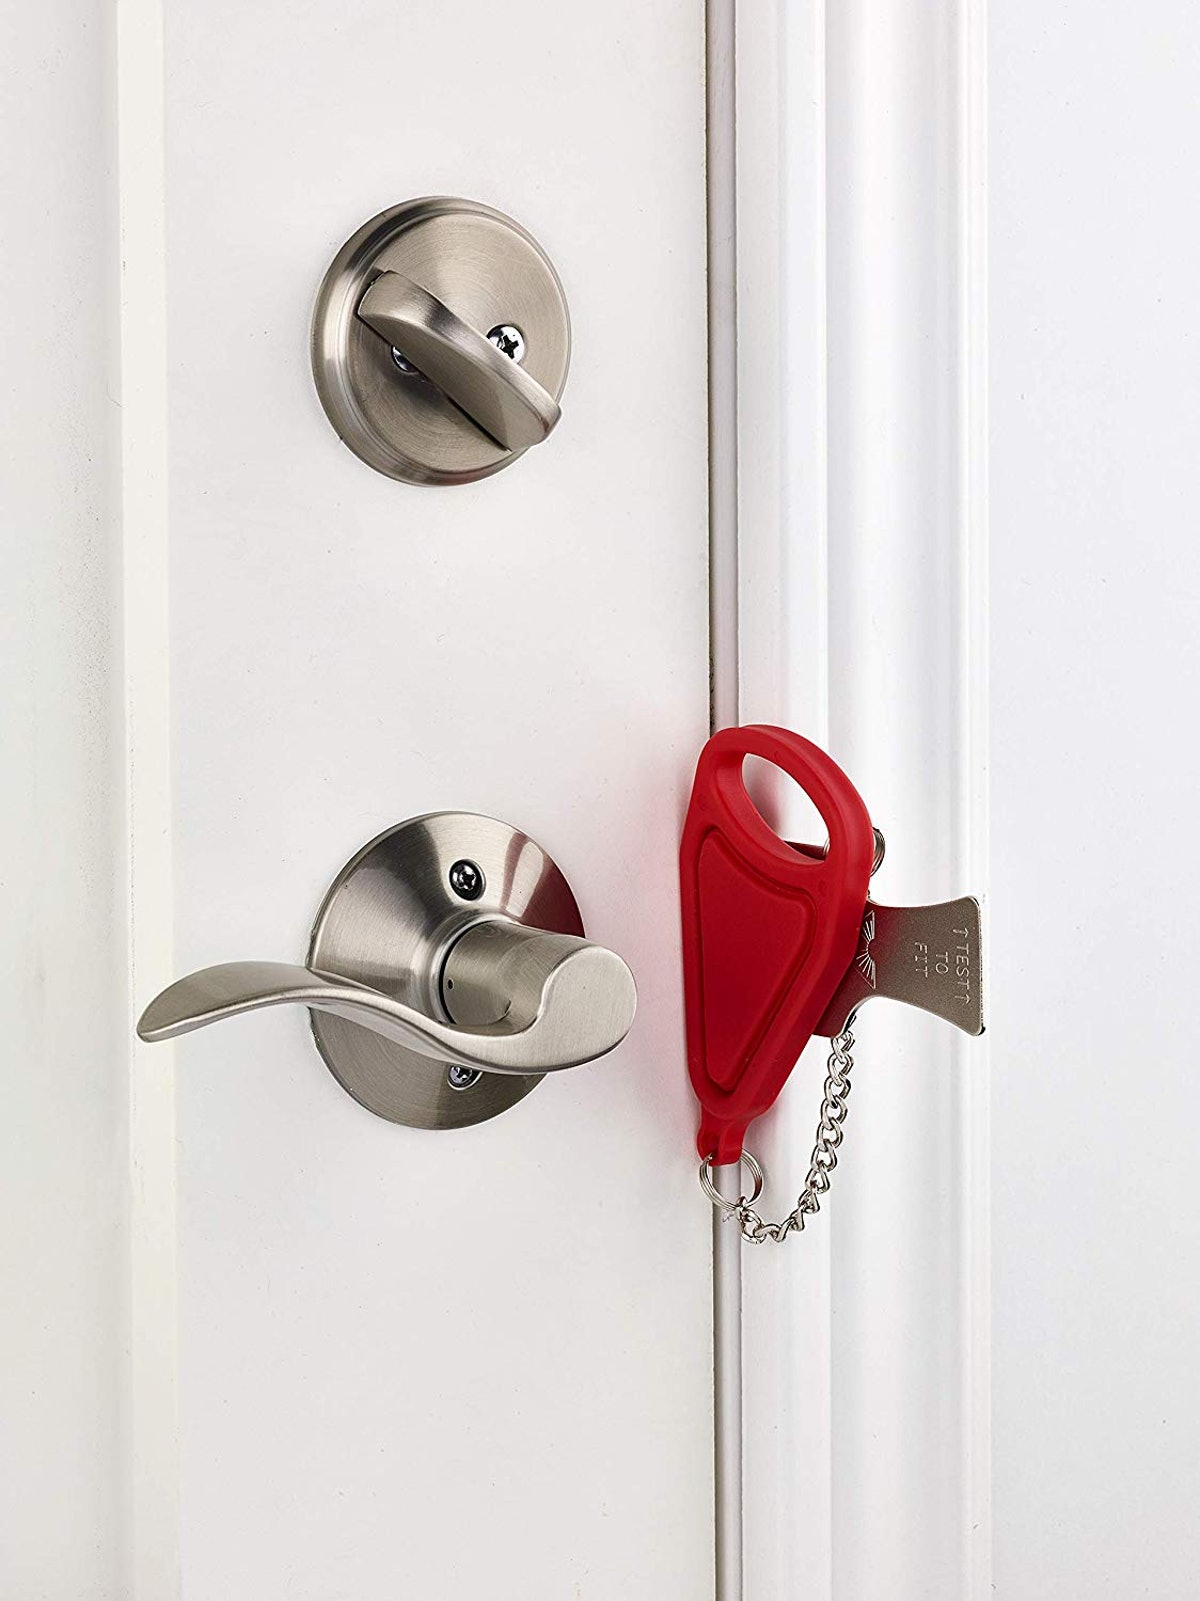 Rishon Enterprises Portable Door Lock (2-Pack)